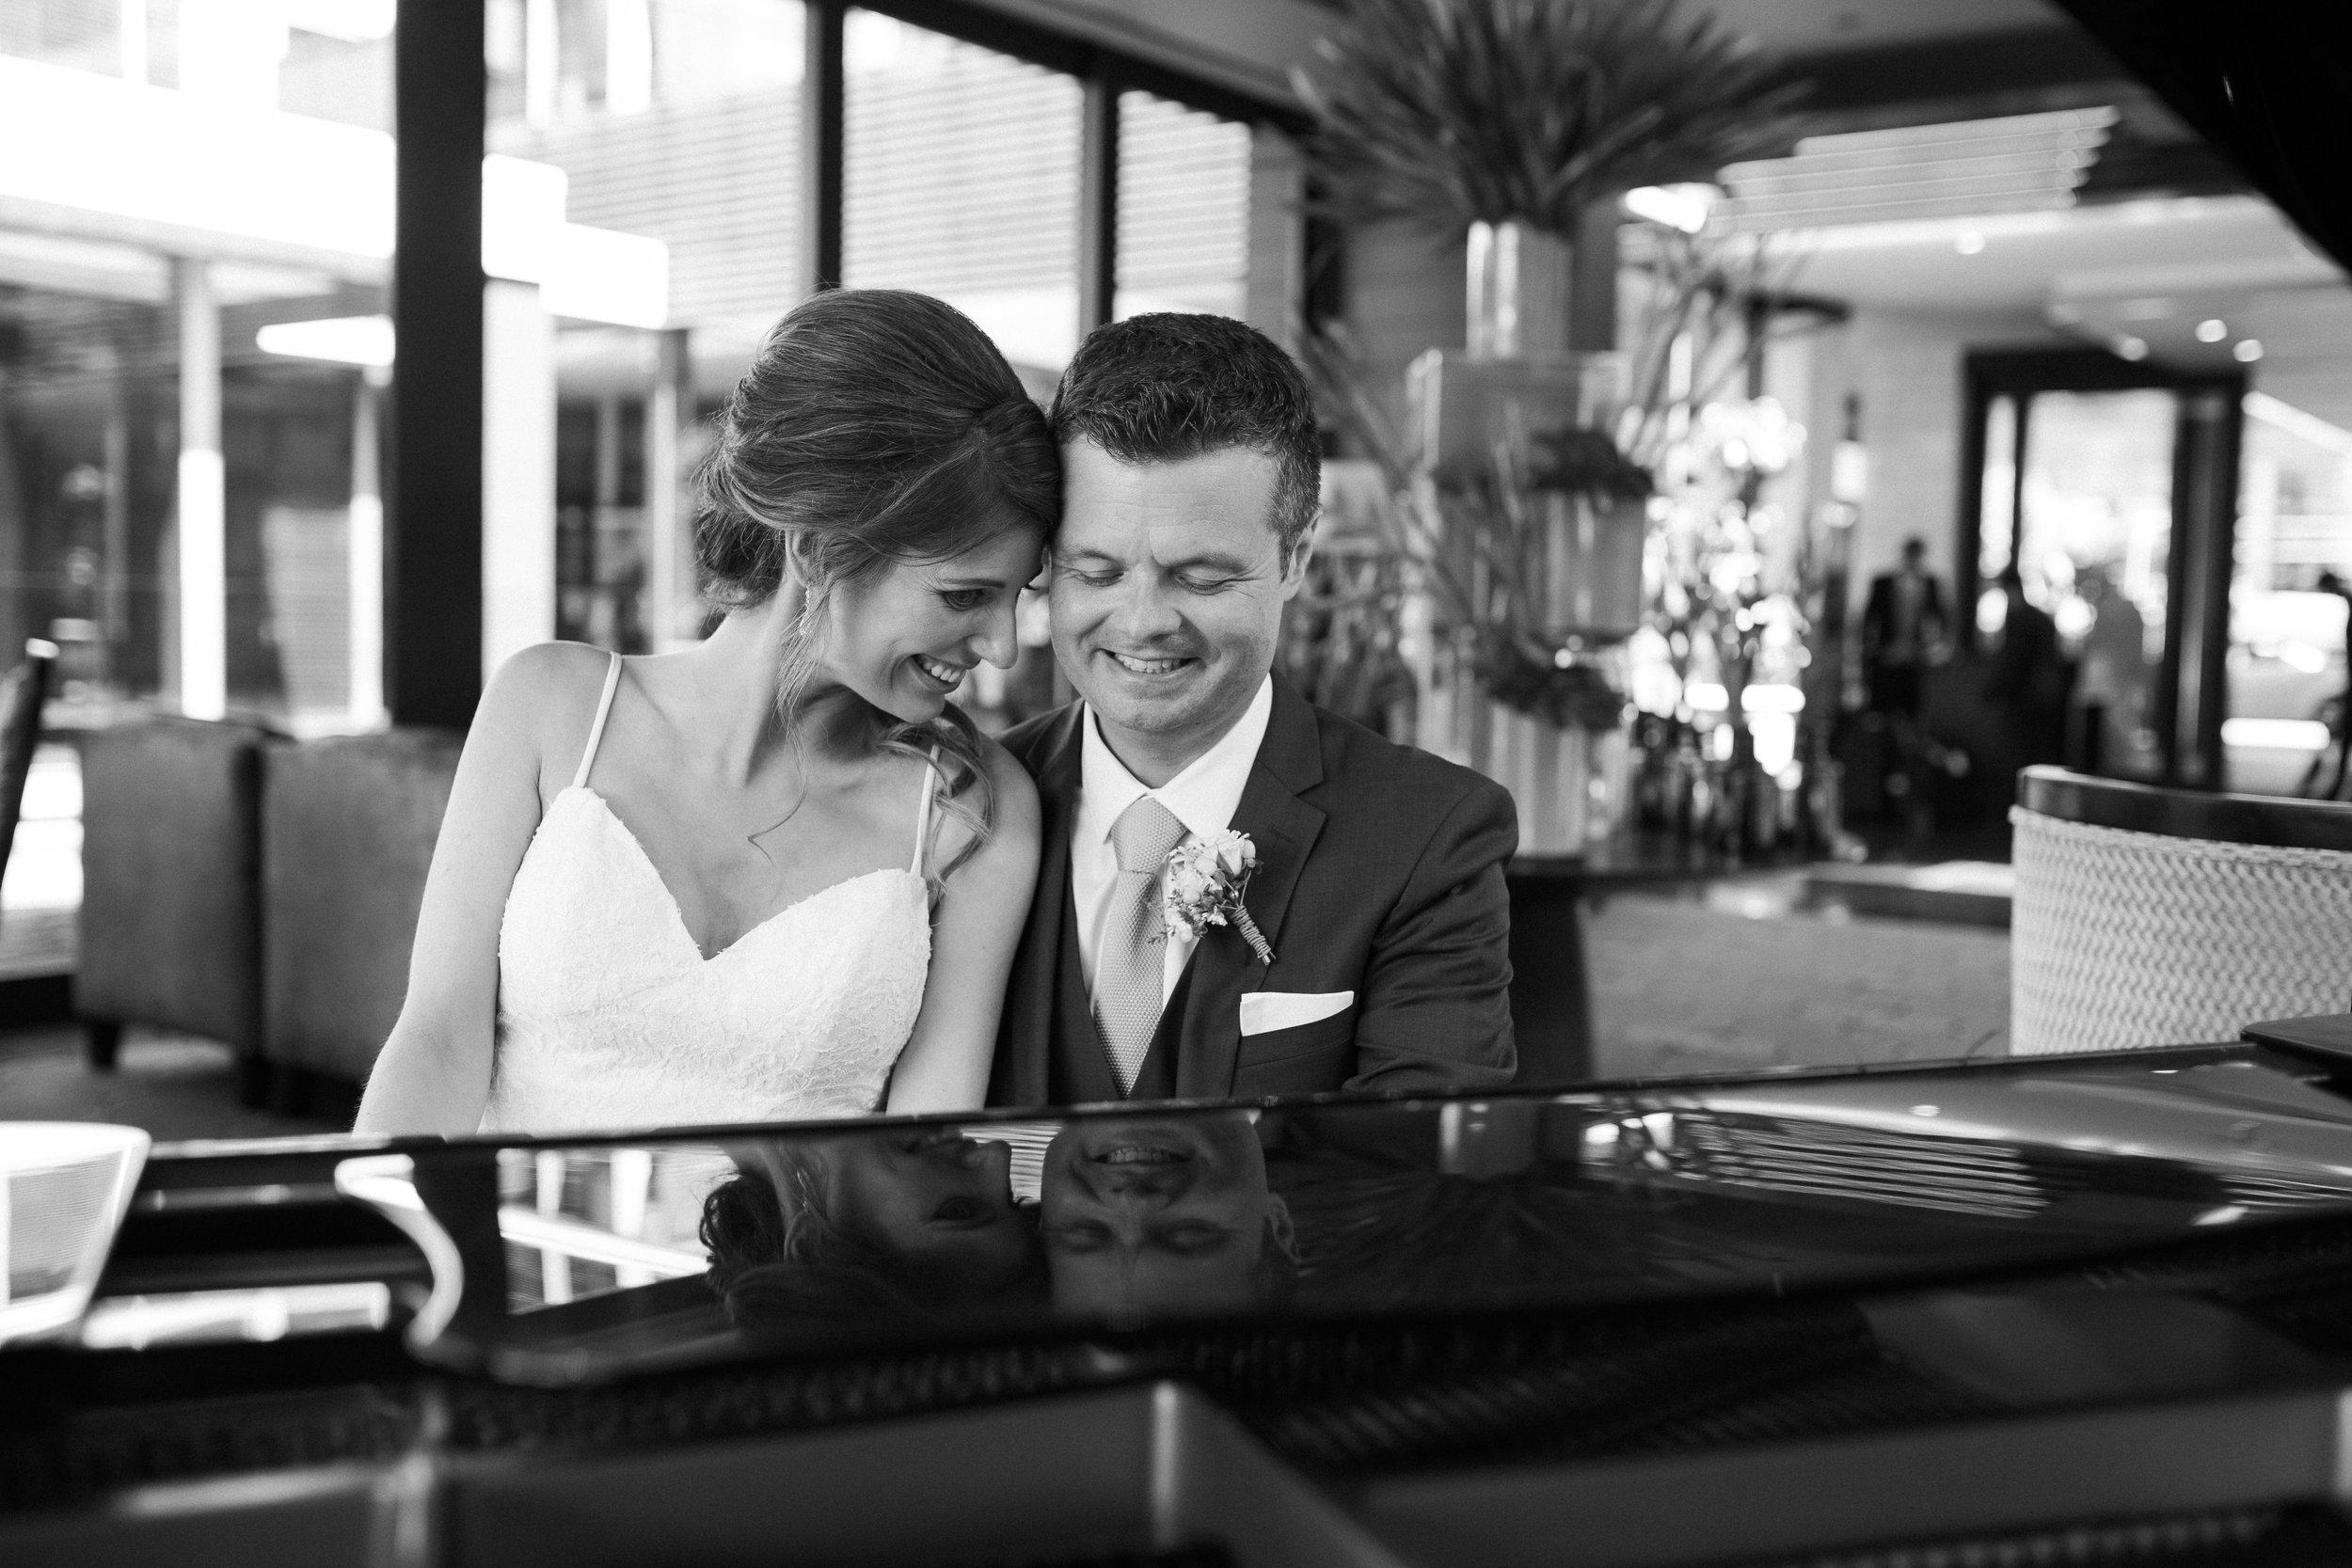 Sofitel wedding photo with piano